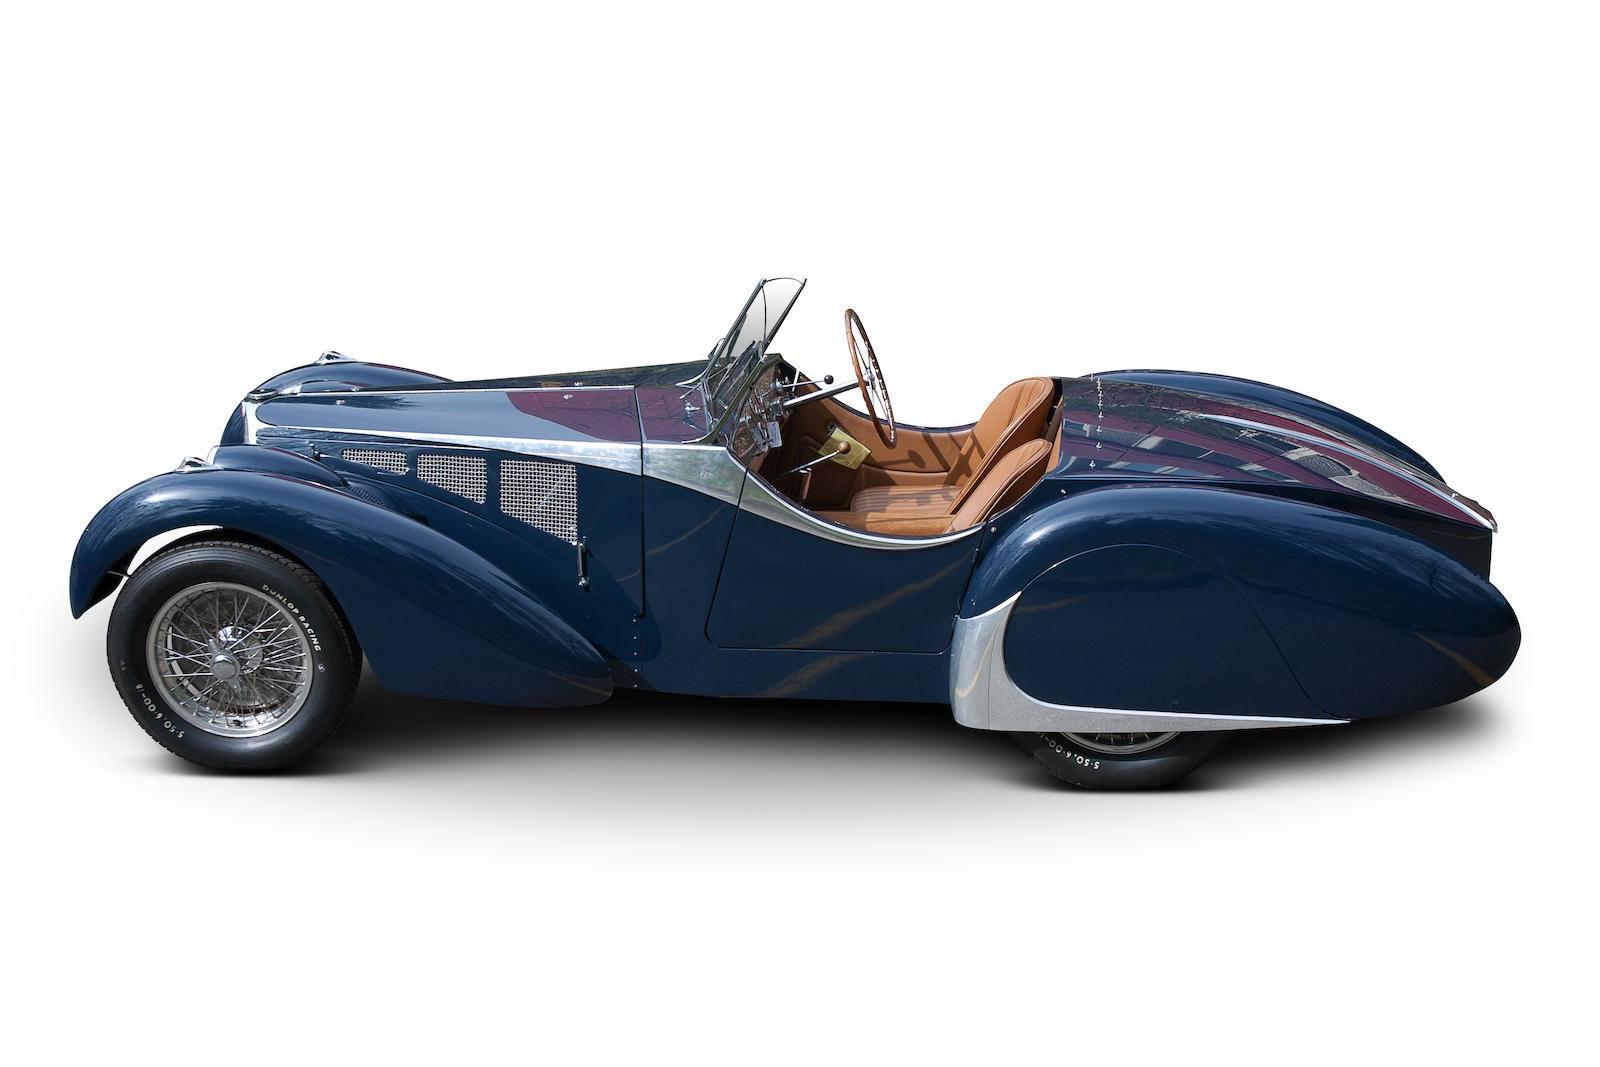 Bugatti-Type-57C-Casar-Special-Roadstar--1938-6